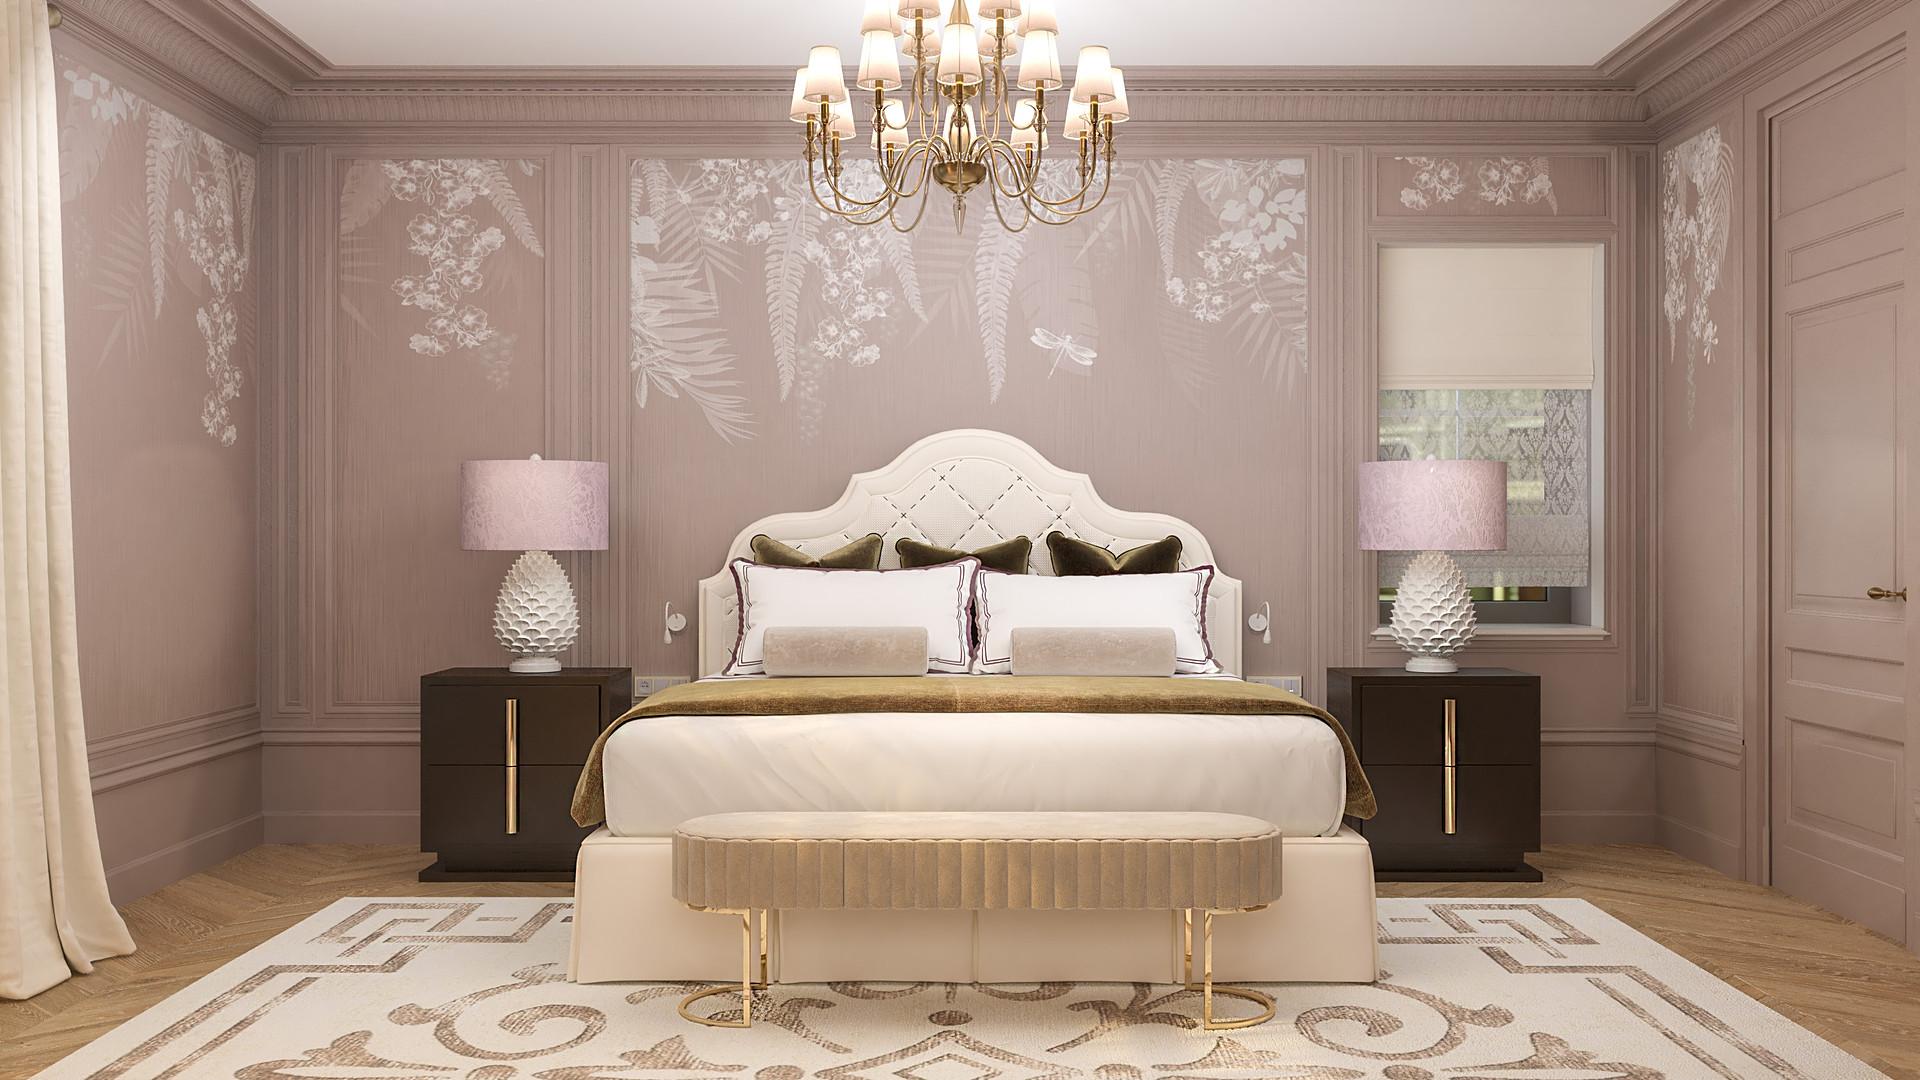 anakleo-bedroom-interior-tropical-wallpa